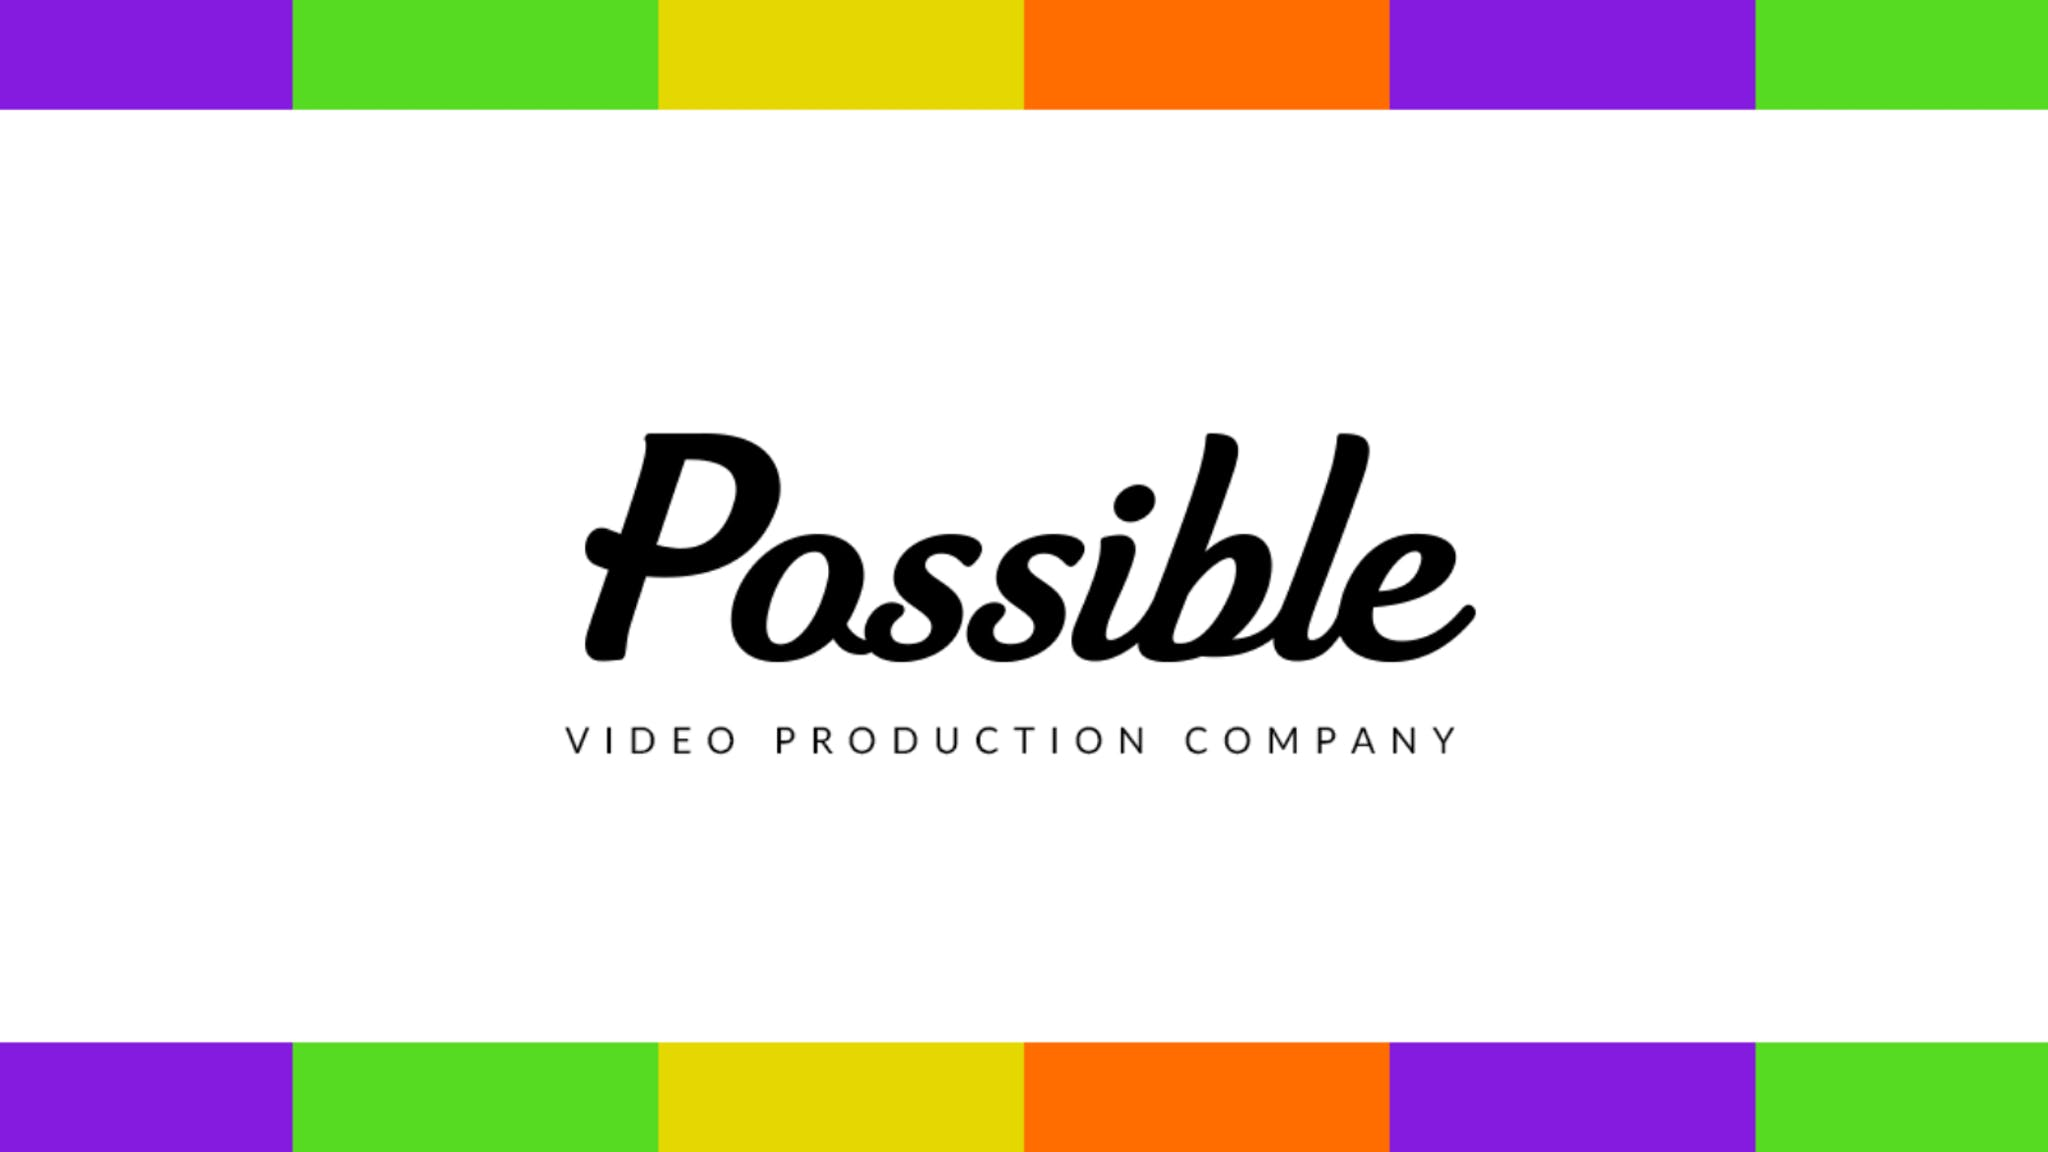 Possibleさま/企業サイト